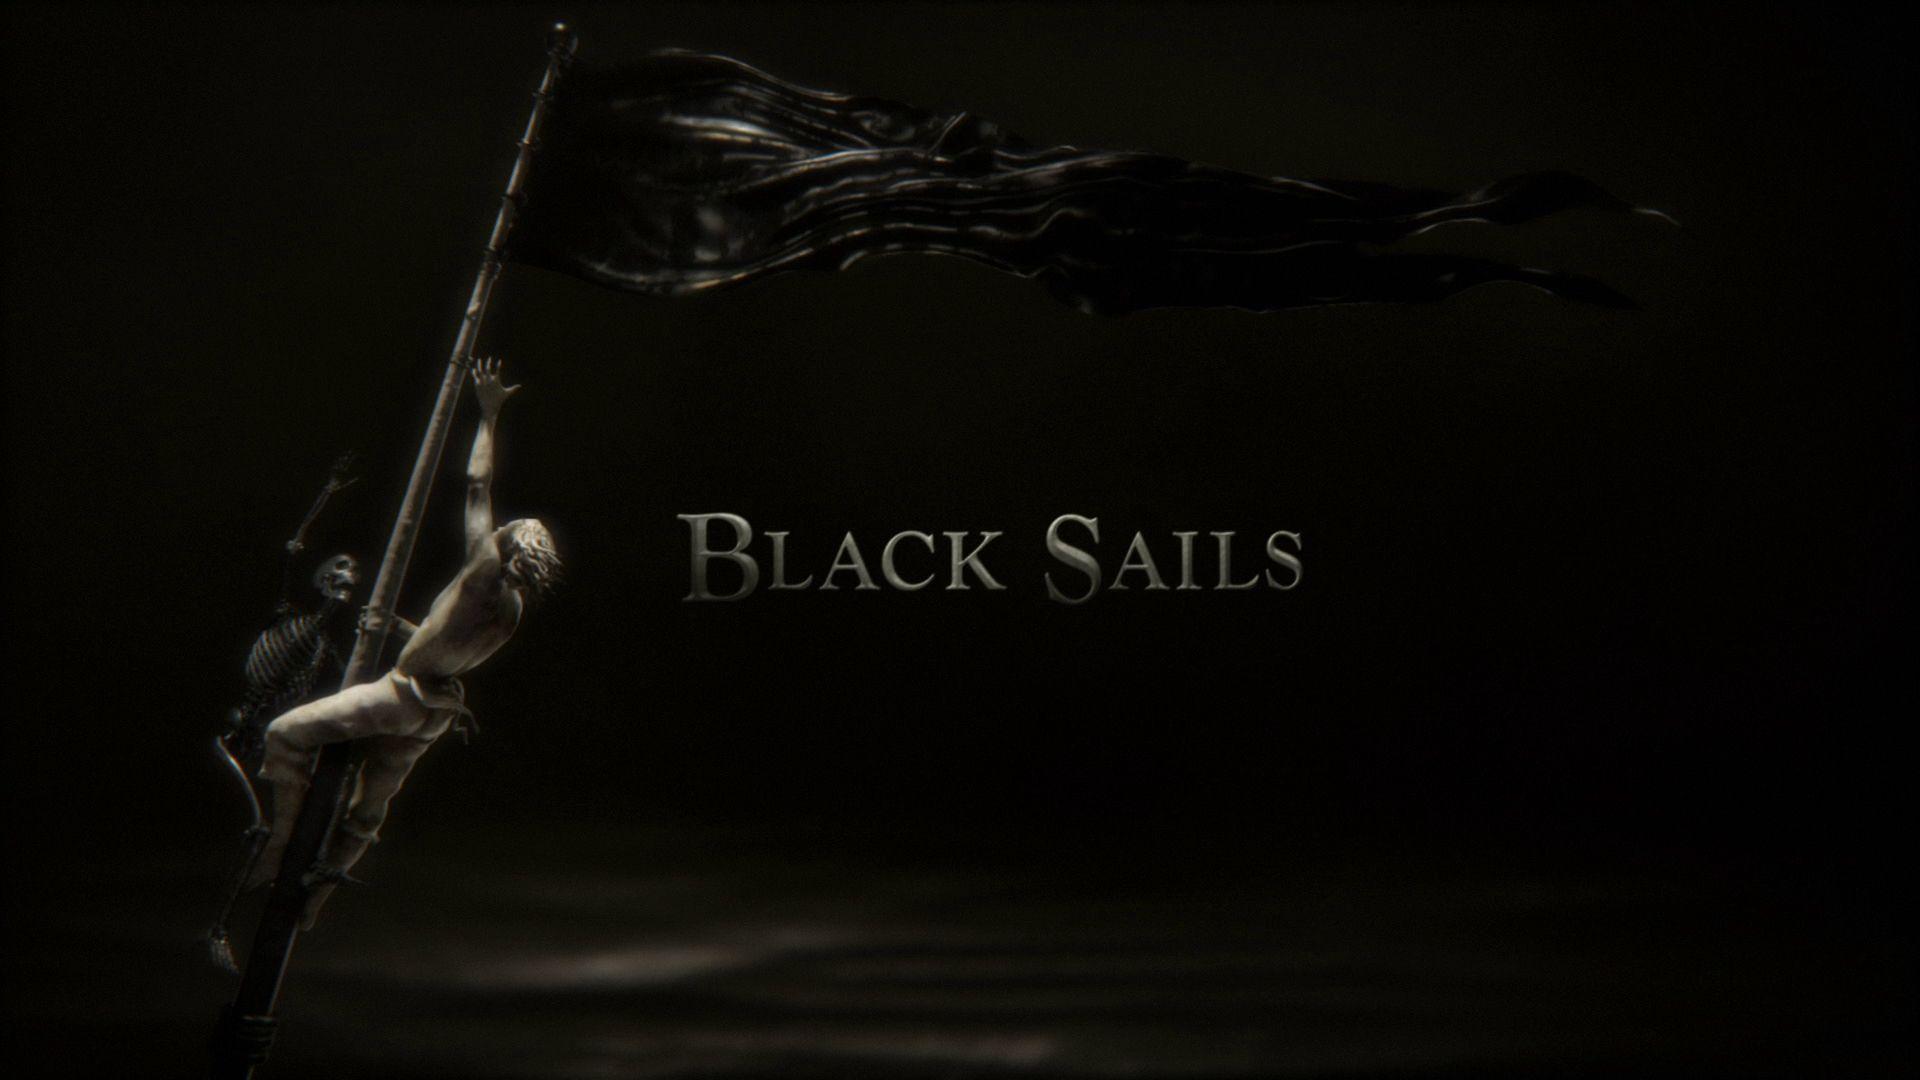 black sails wallpaper cerca con google black sails